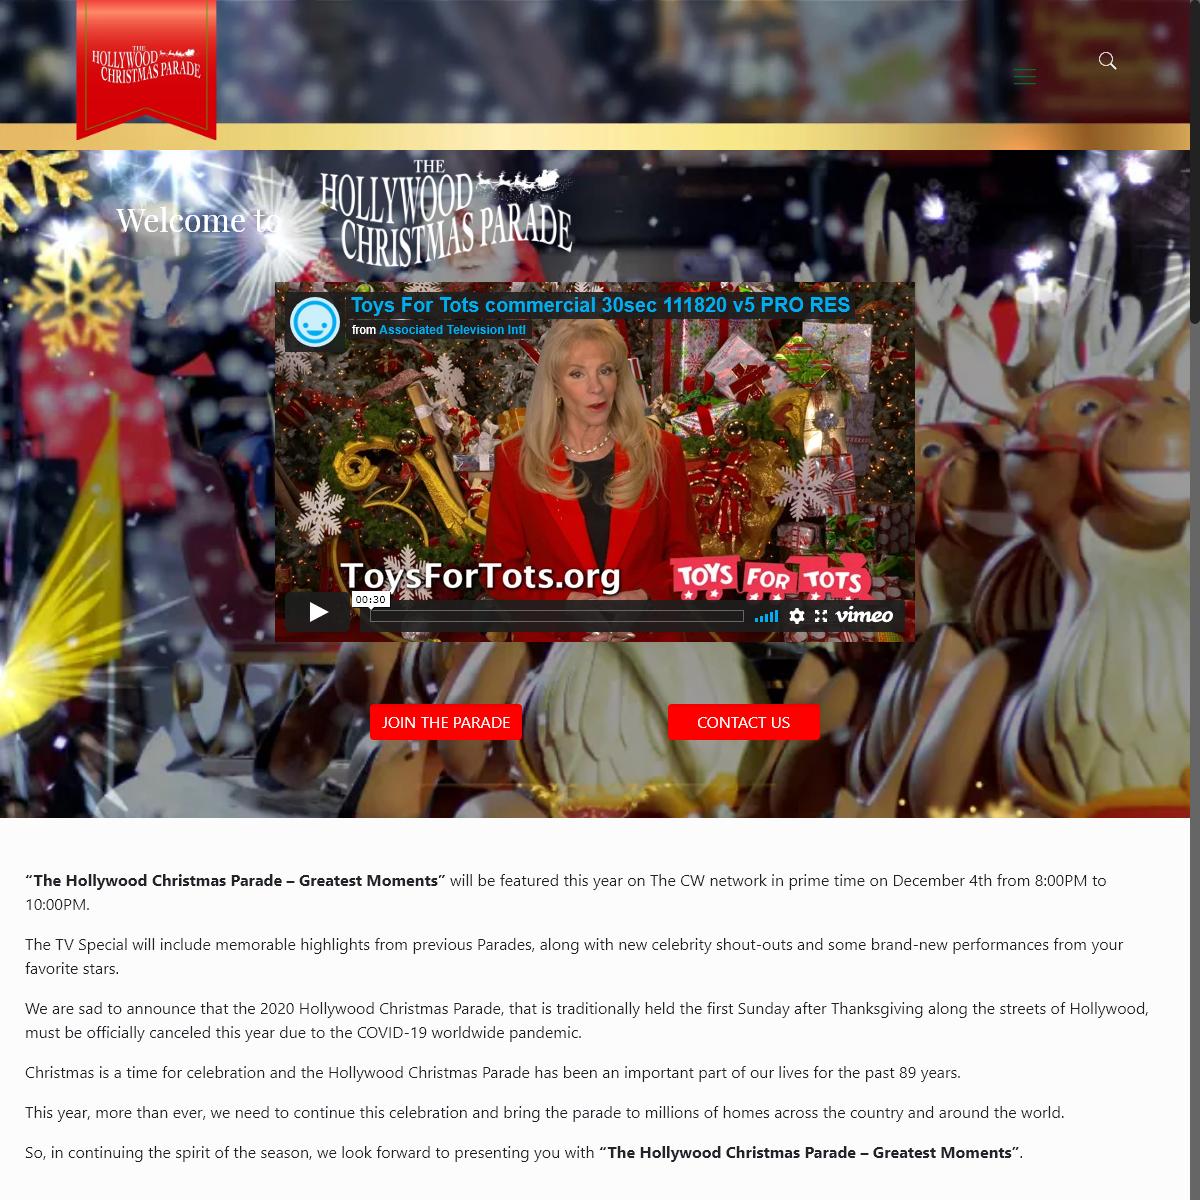 Home - The Hollywood Christmas Parade